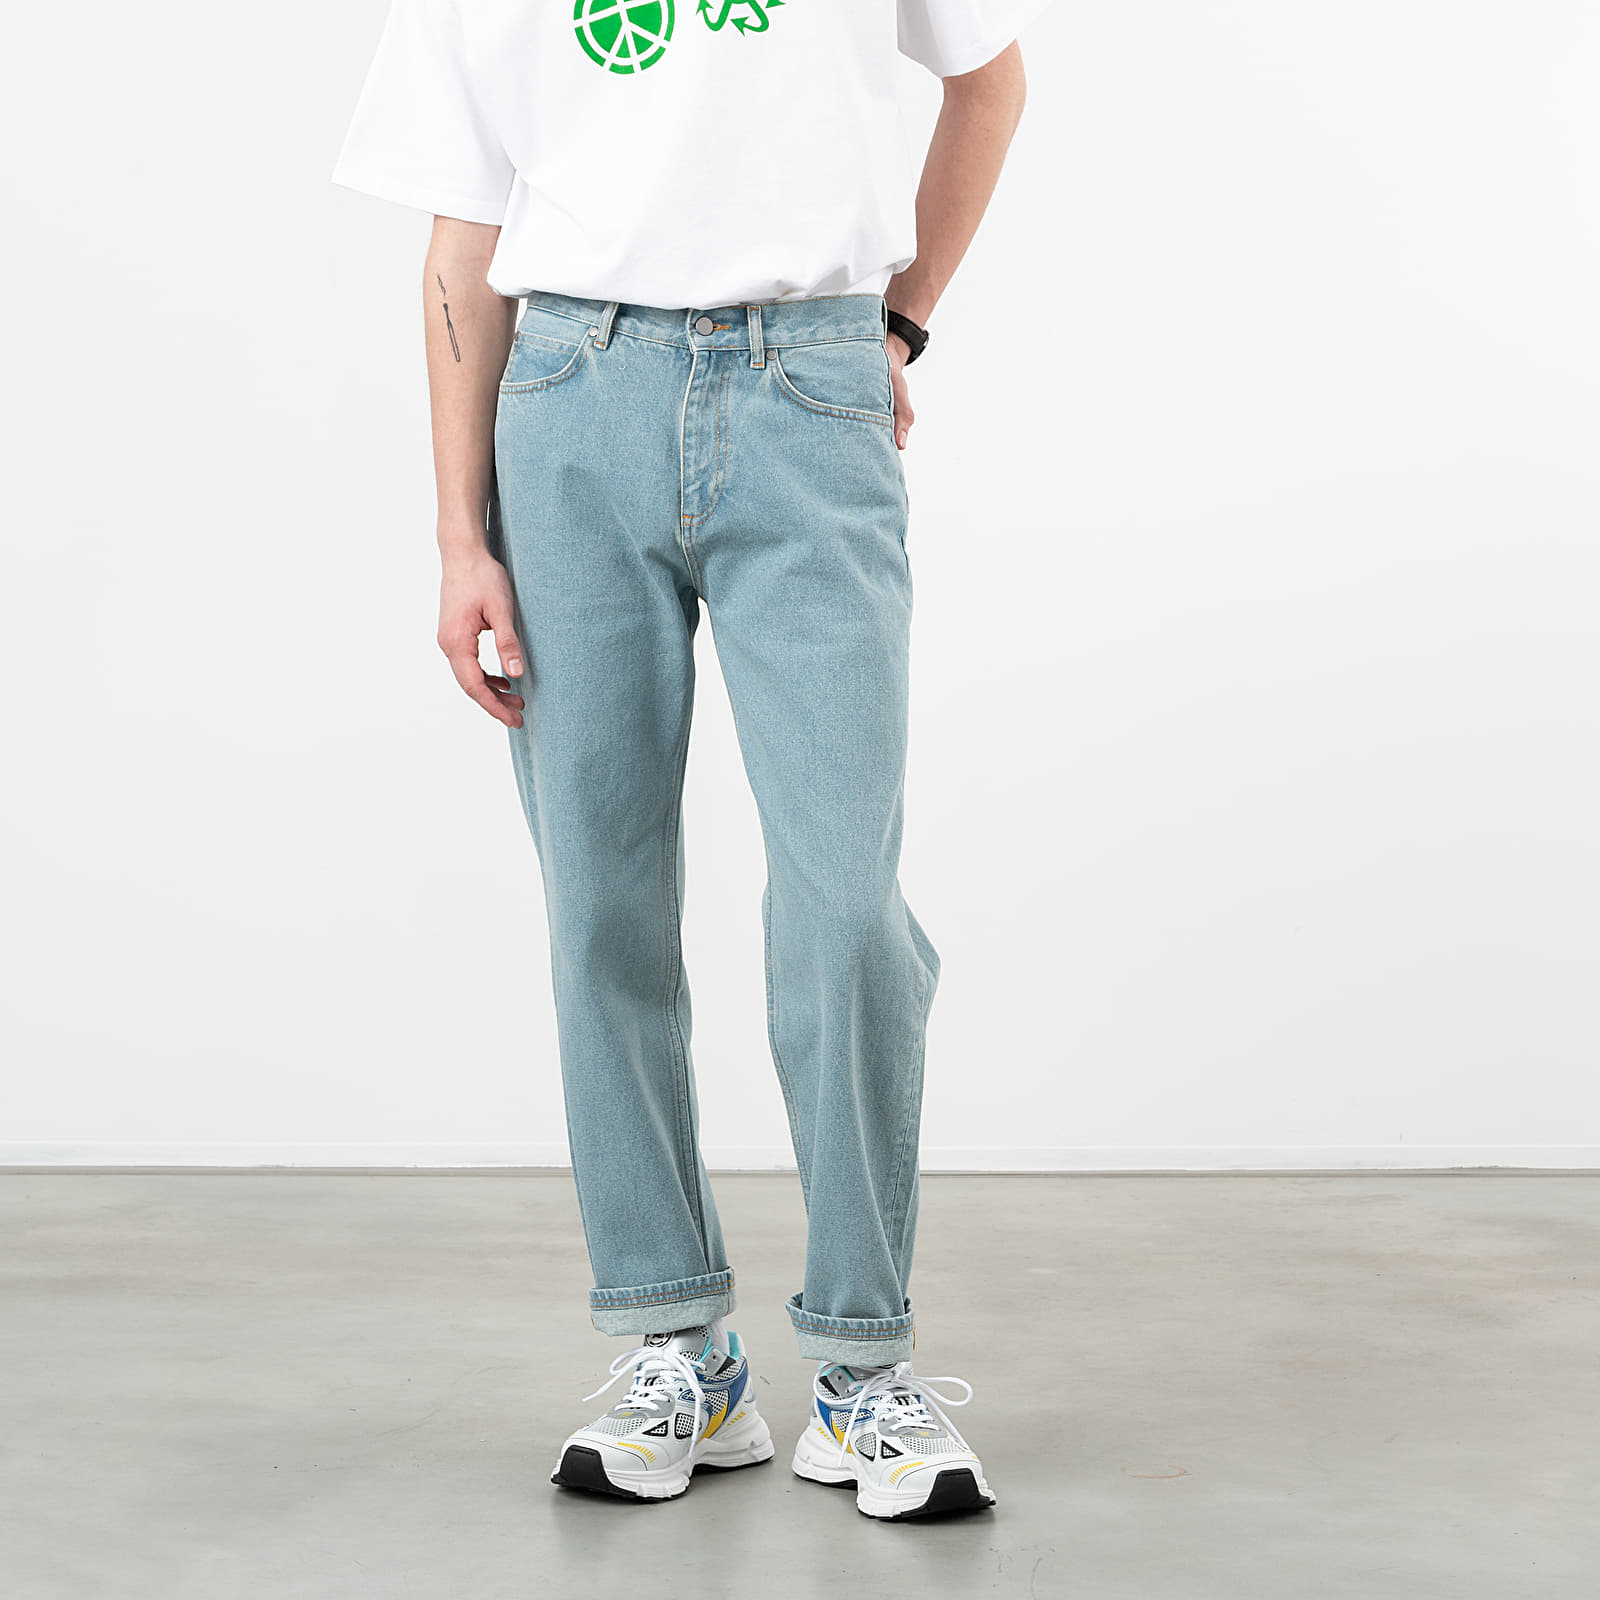 Pantalons PACCBET Loose Straight Cut Jeans Light Wash Blue